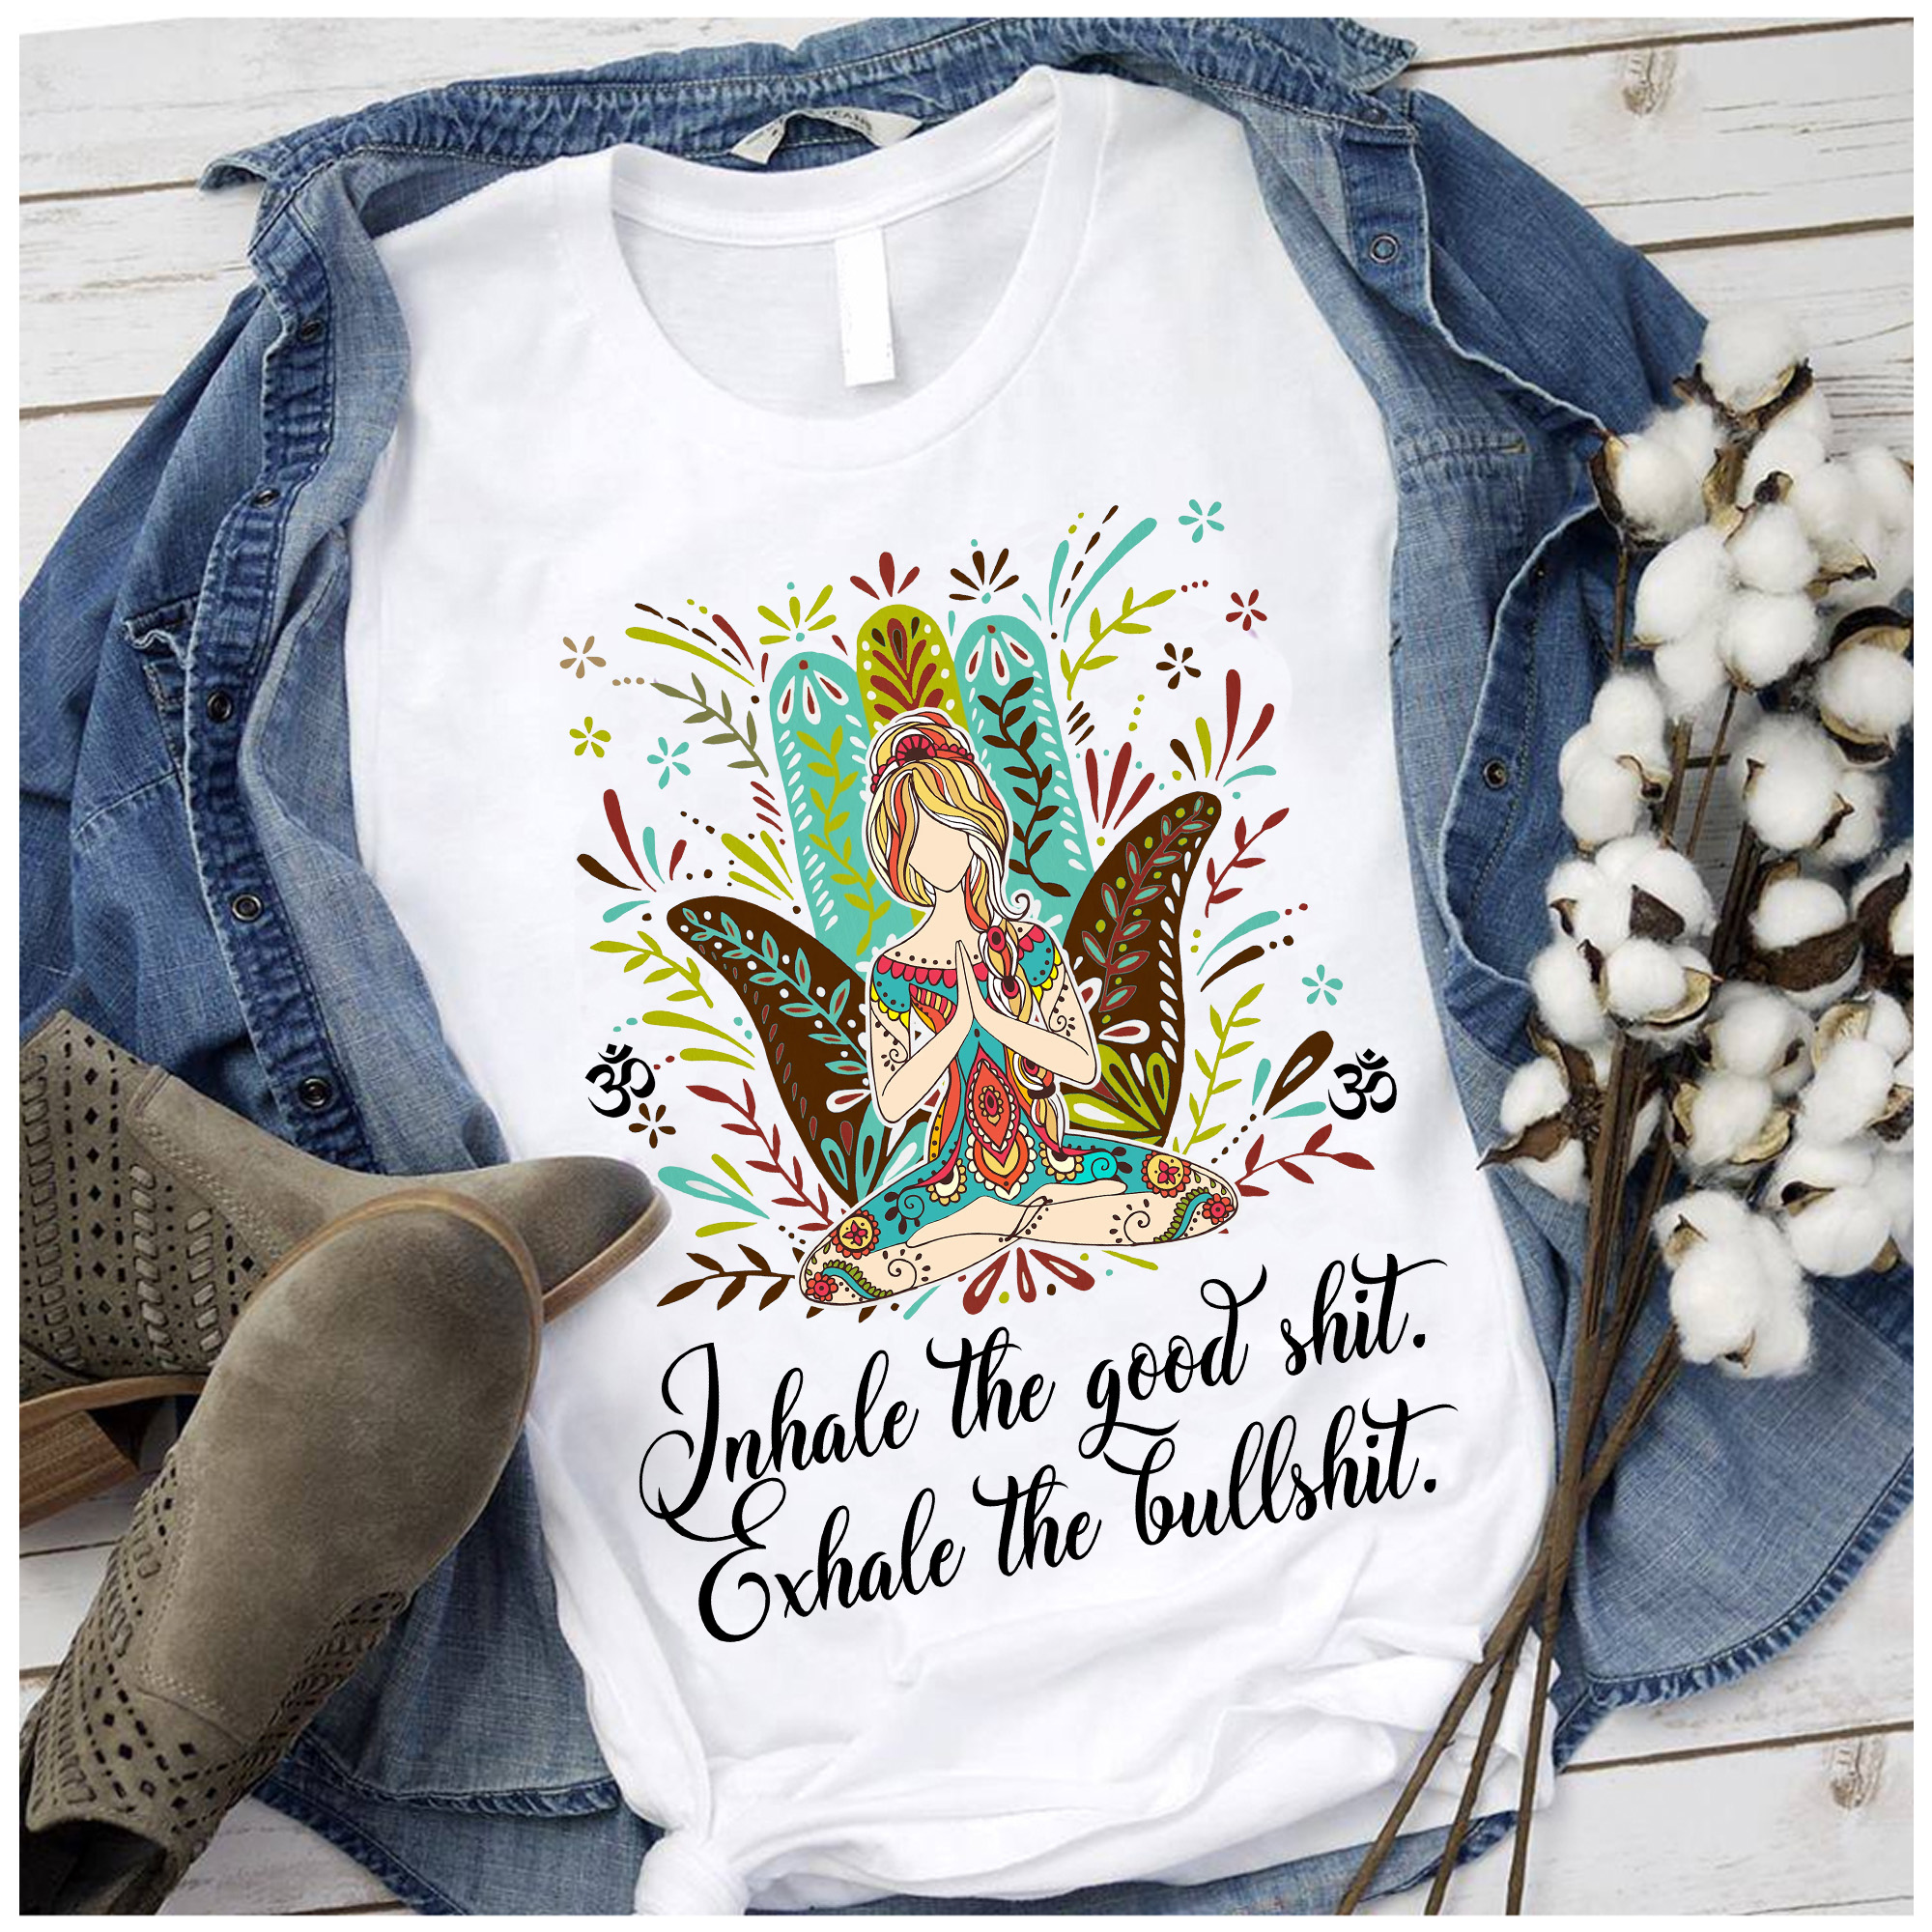 Hippie Girl Yoga Shirt Inhale The Goodshit Exhale The Bullshit